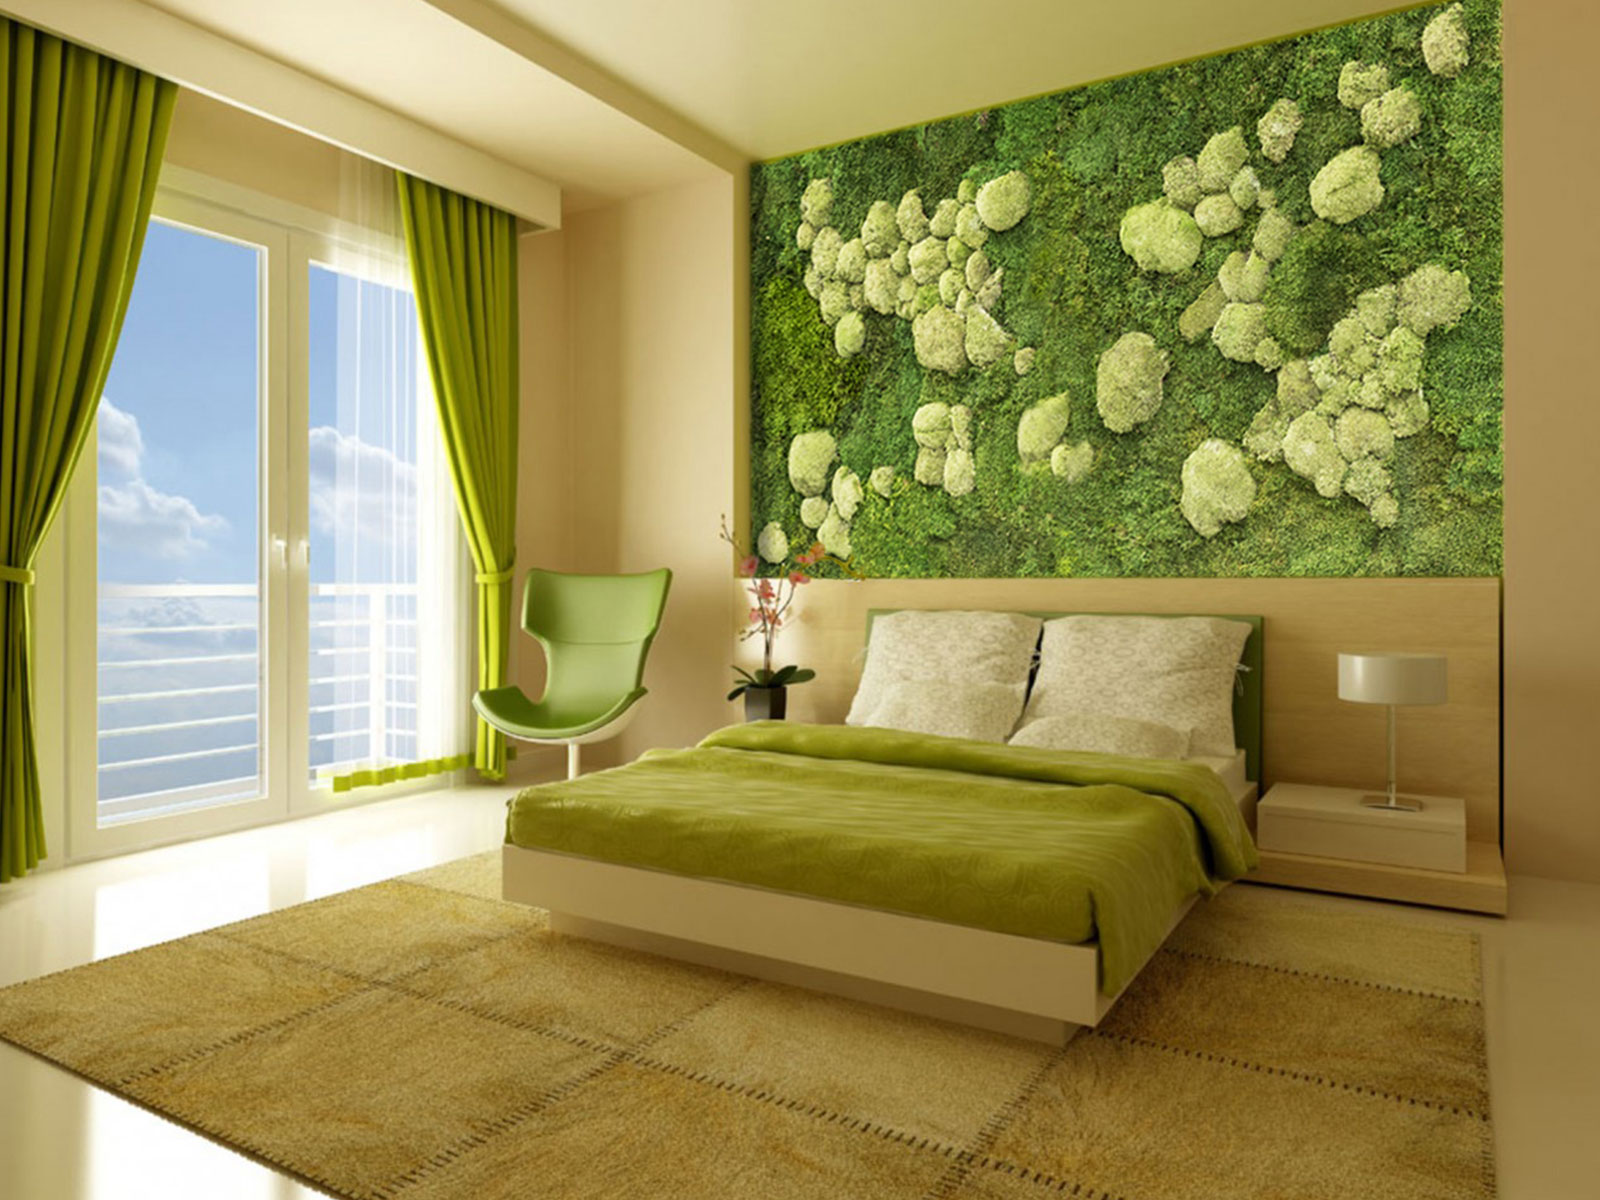 mooswand selber bauen freund gmbh moosgreen flexible moosbilder selber machen easymoos moosw. Black Bedroom Furniture Sets. Home Design Ideas